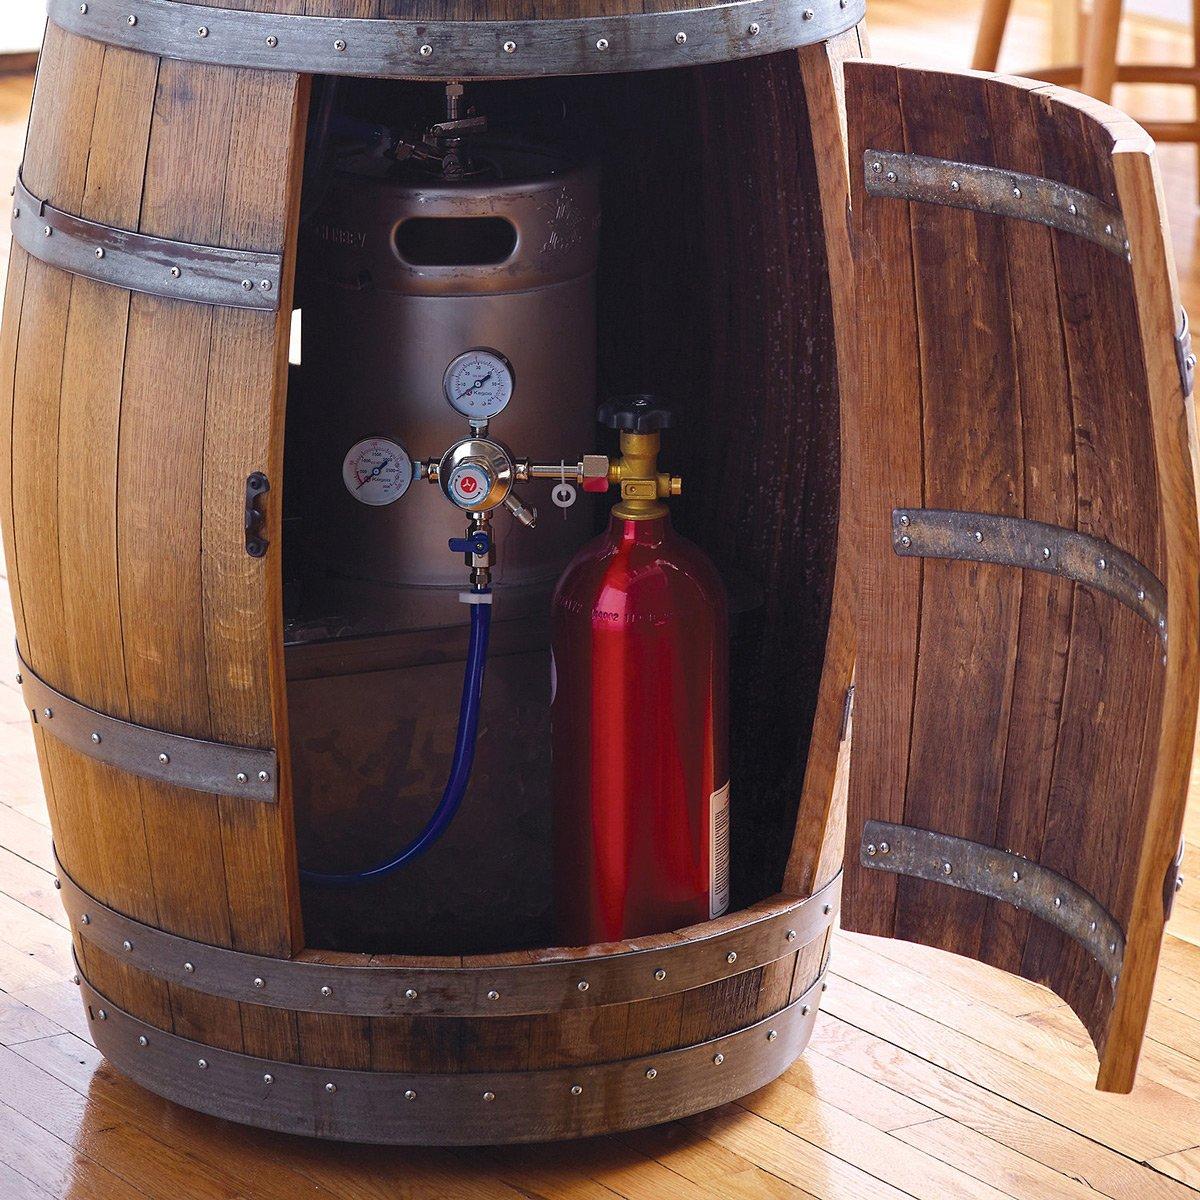 Recycled Wine Barrel Kegerator The Green Head